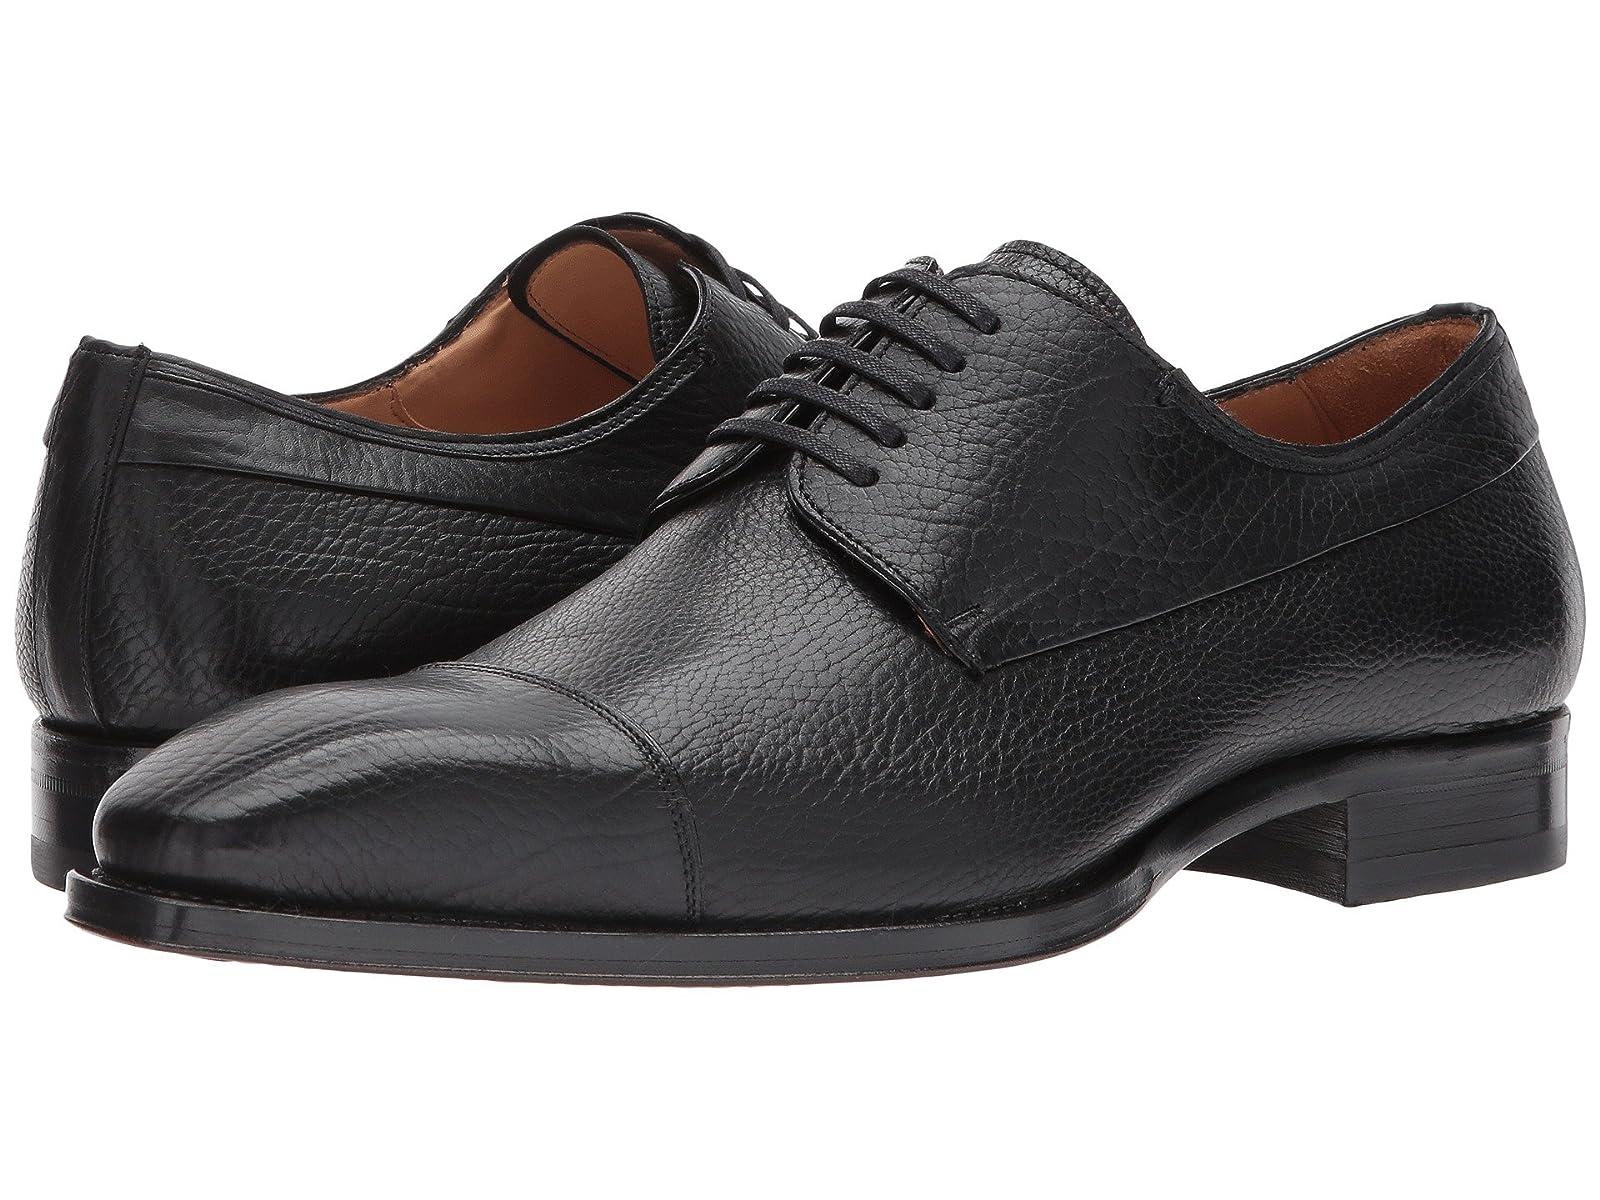 Mezlan PulpiAtmospheric grades have affordable shoes